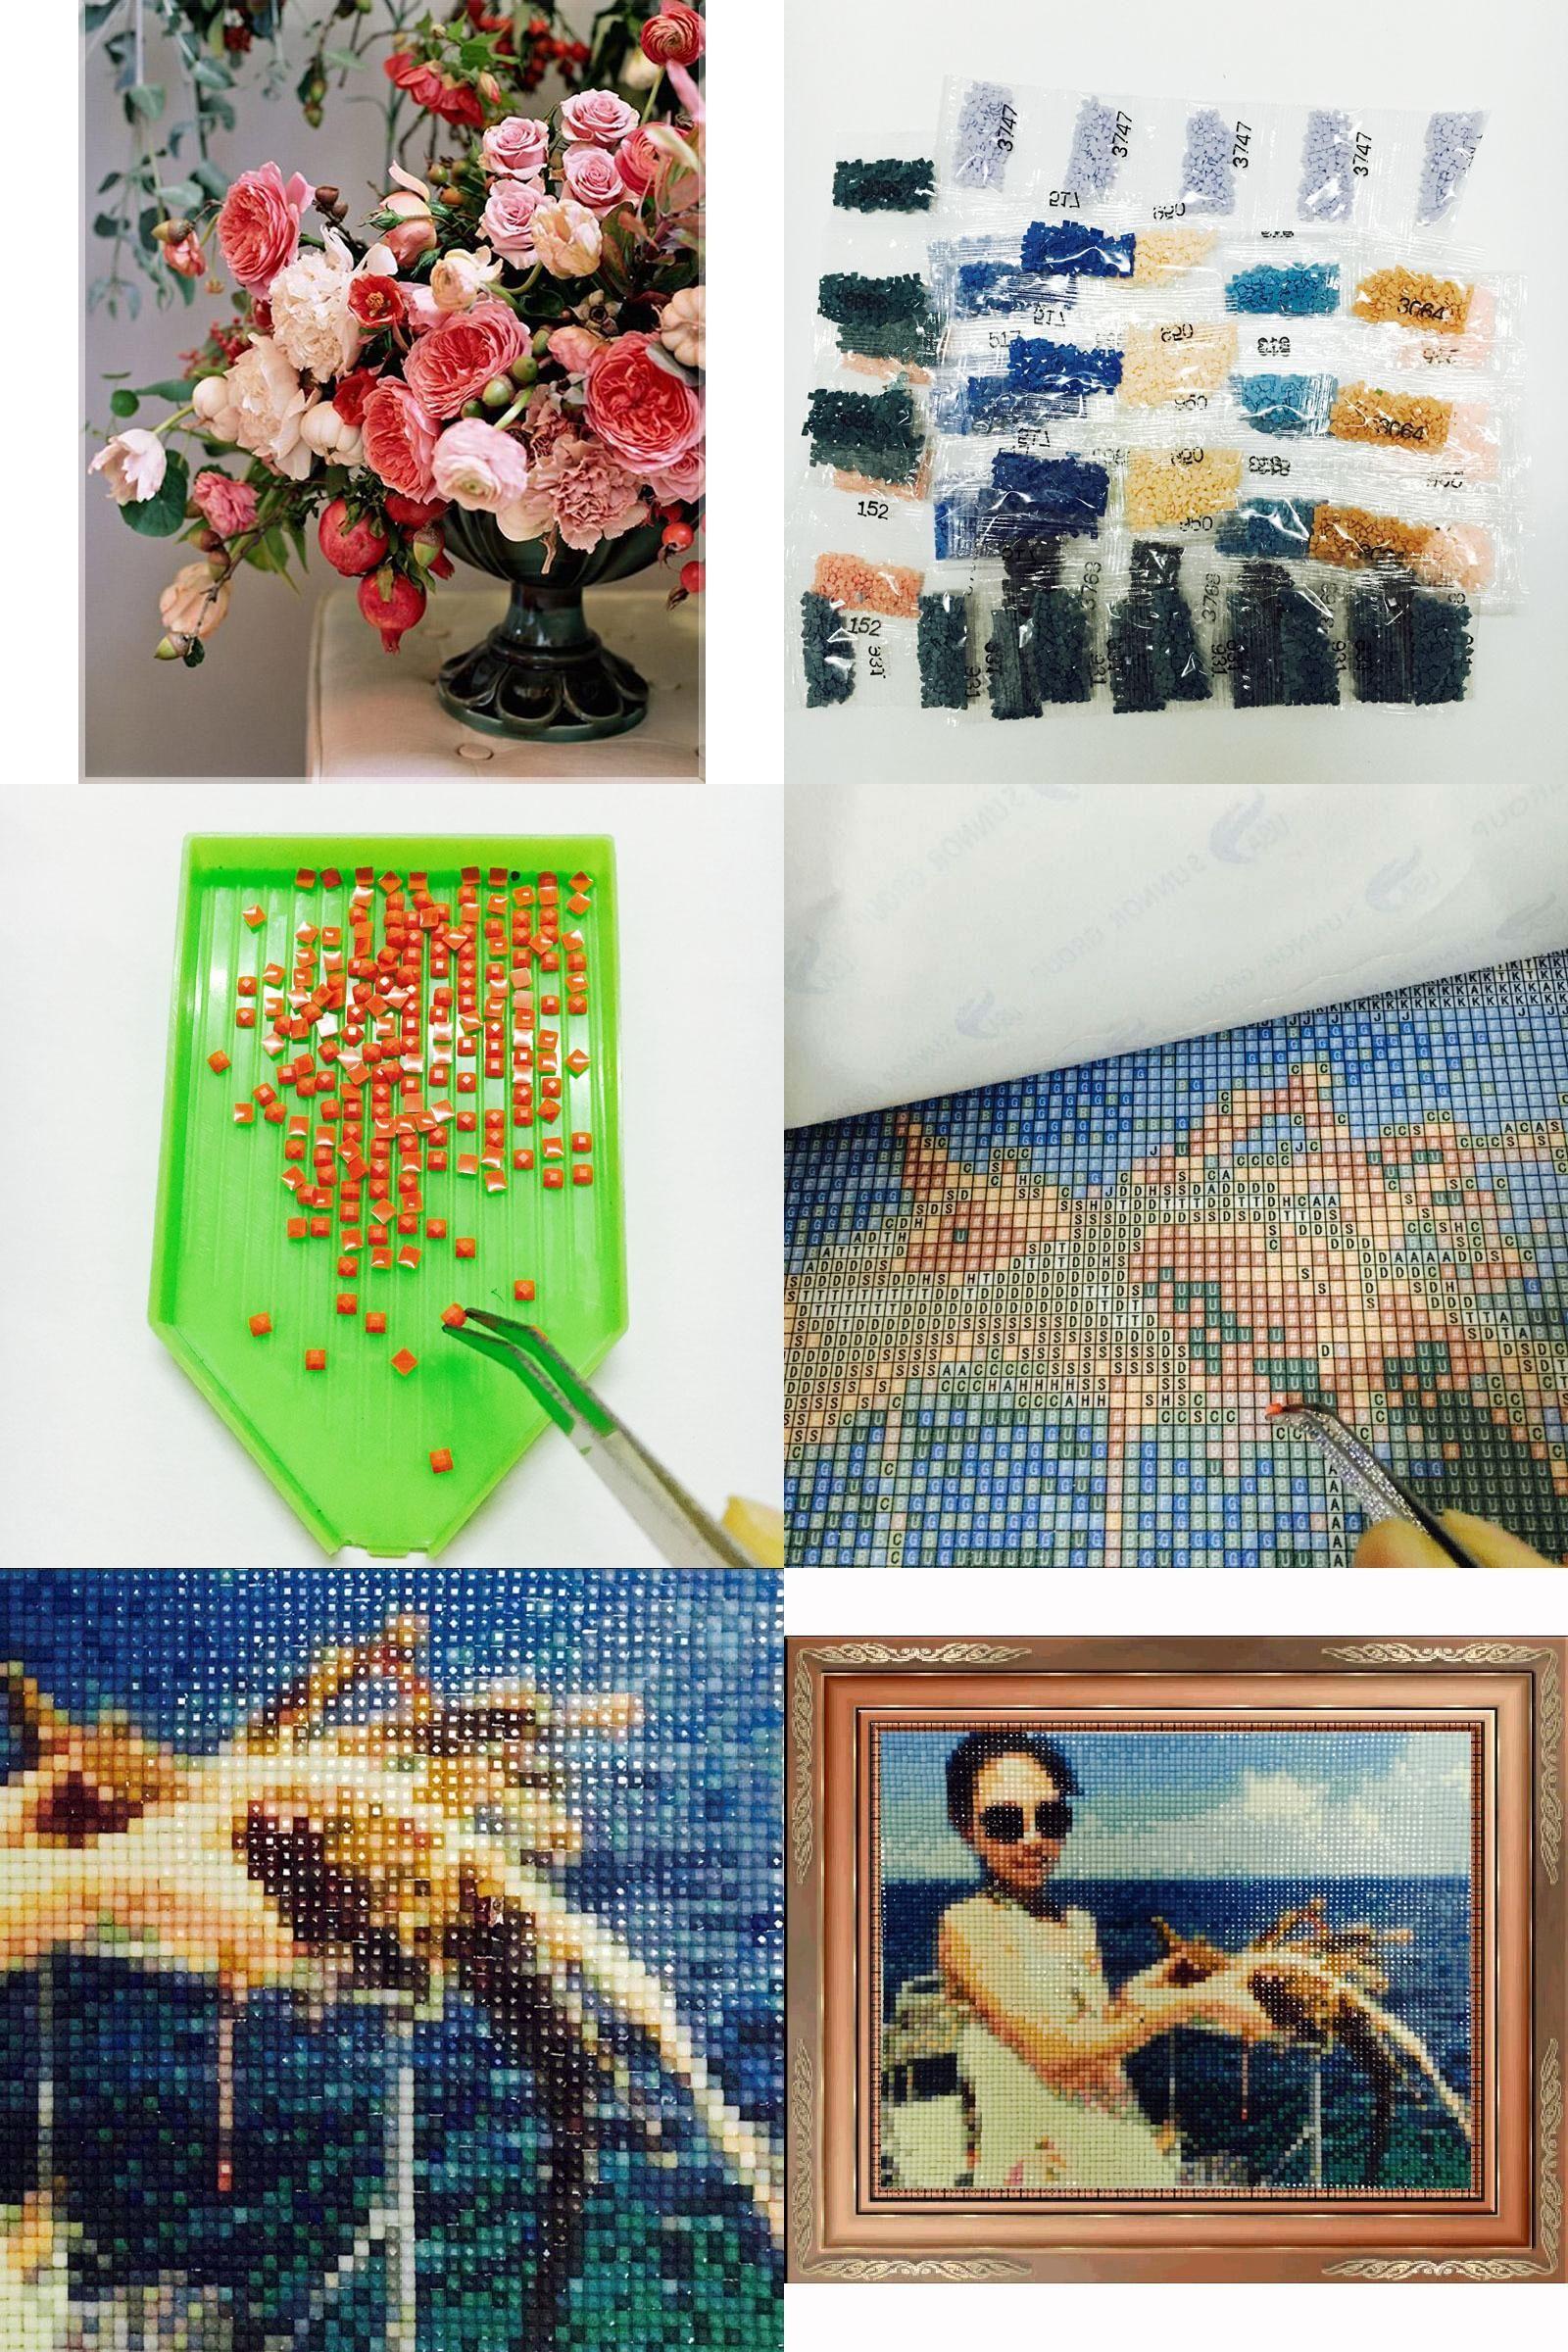 [Visit to Buy] NEW 3D Diamond Painting Cross Stitch Rose vase Crystal Needlework Diamond Embroidery Flower Full Diamond Decorative #Advertisement